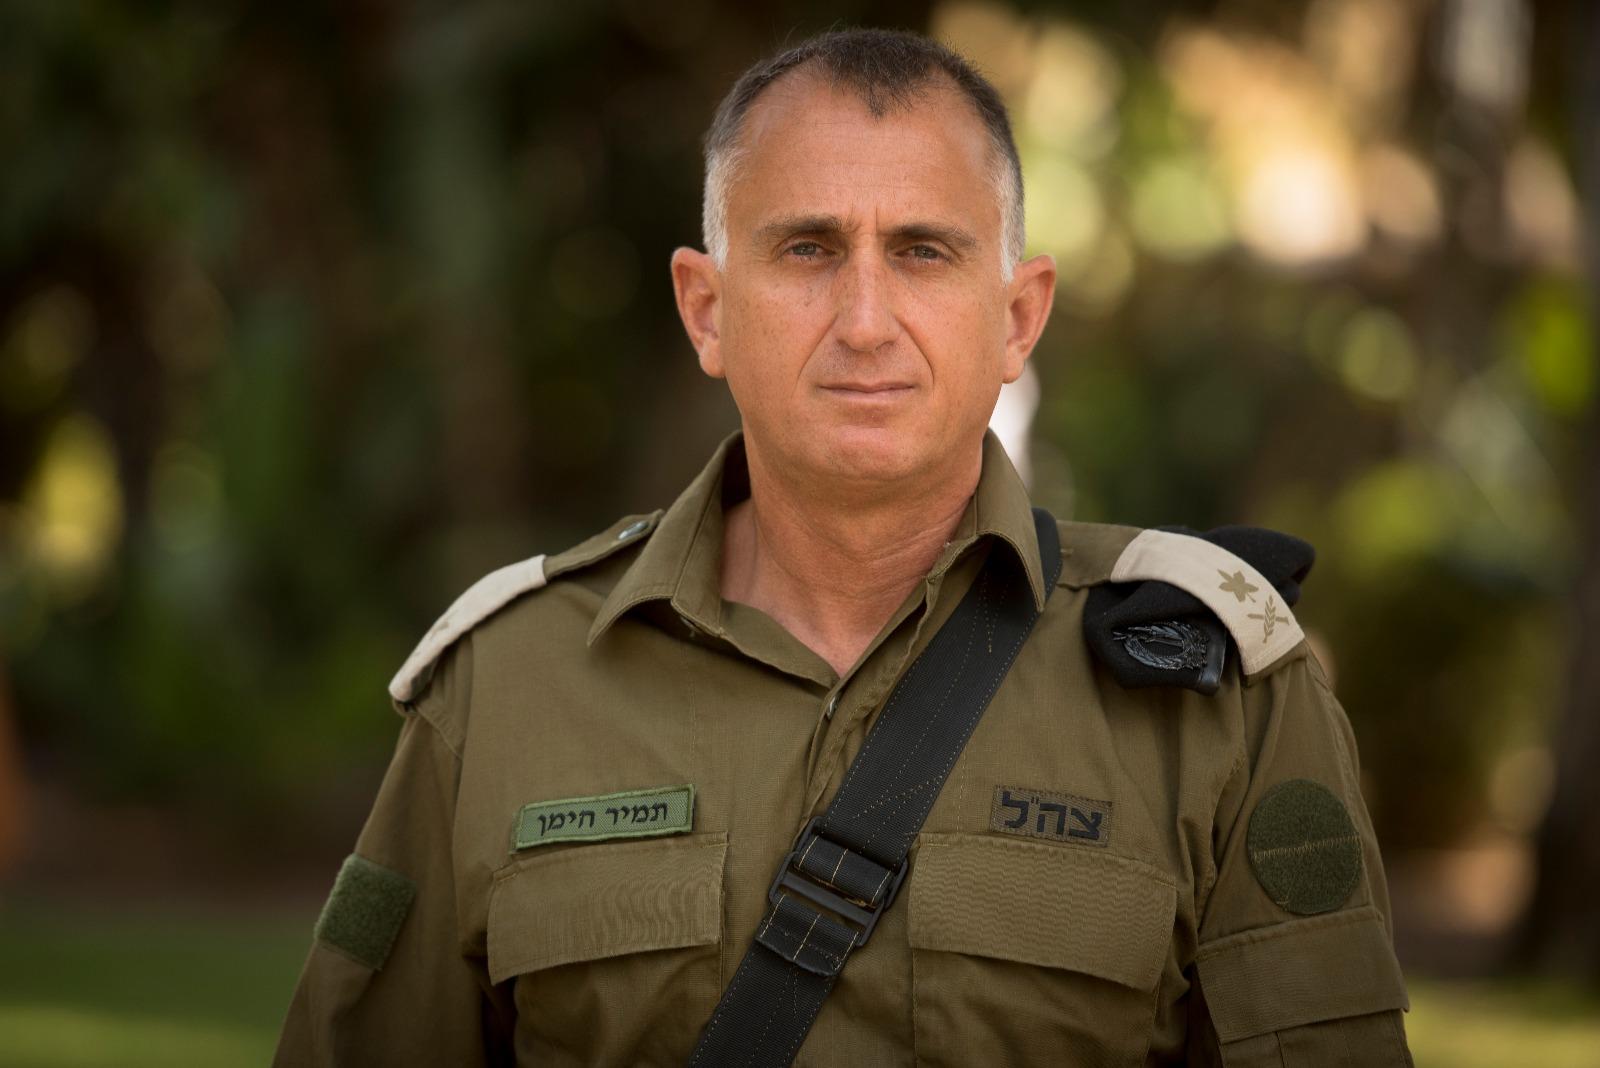 Israeli Military IDF Infantry Lieutenant Colonel senior officer Uniform Rank new